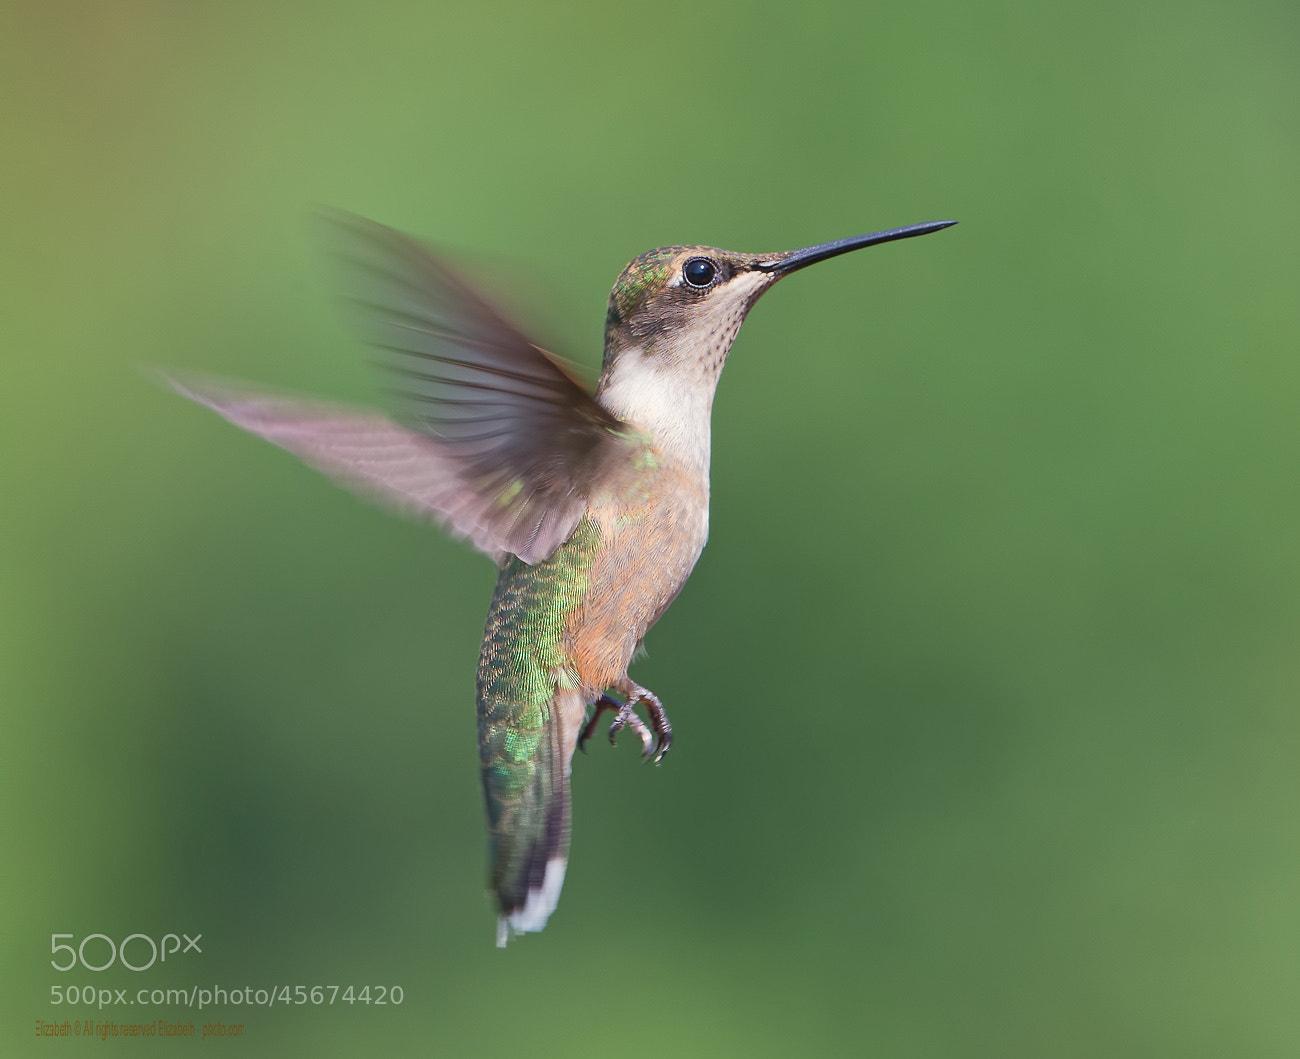 Photograph Hummingbird flight by Elizabeth.  E. on 500px